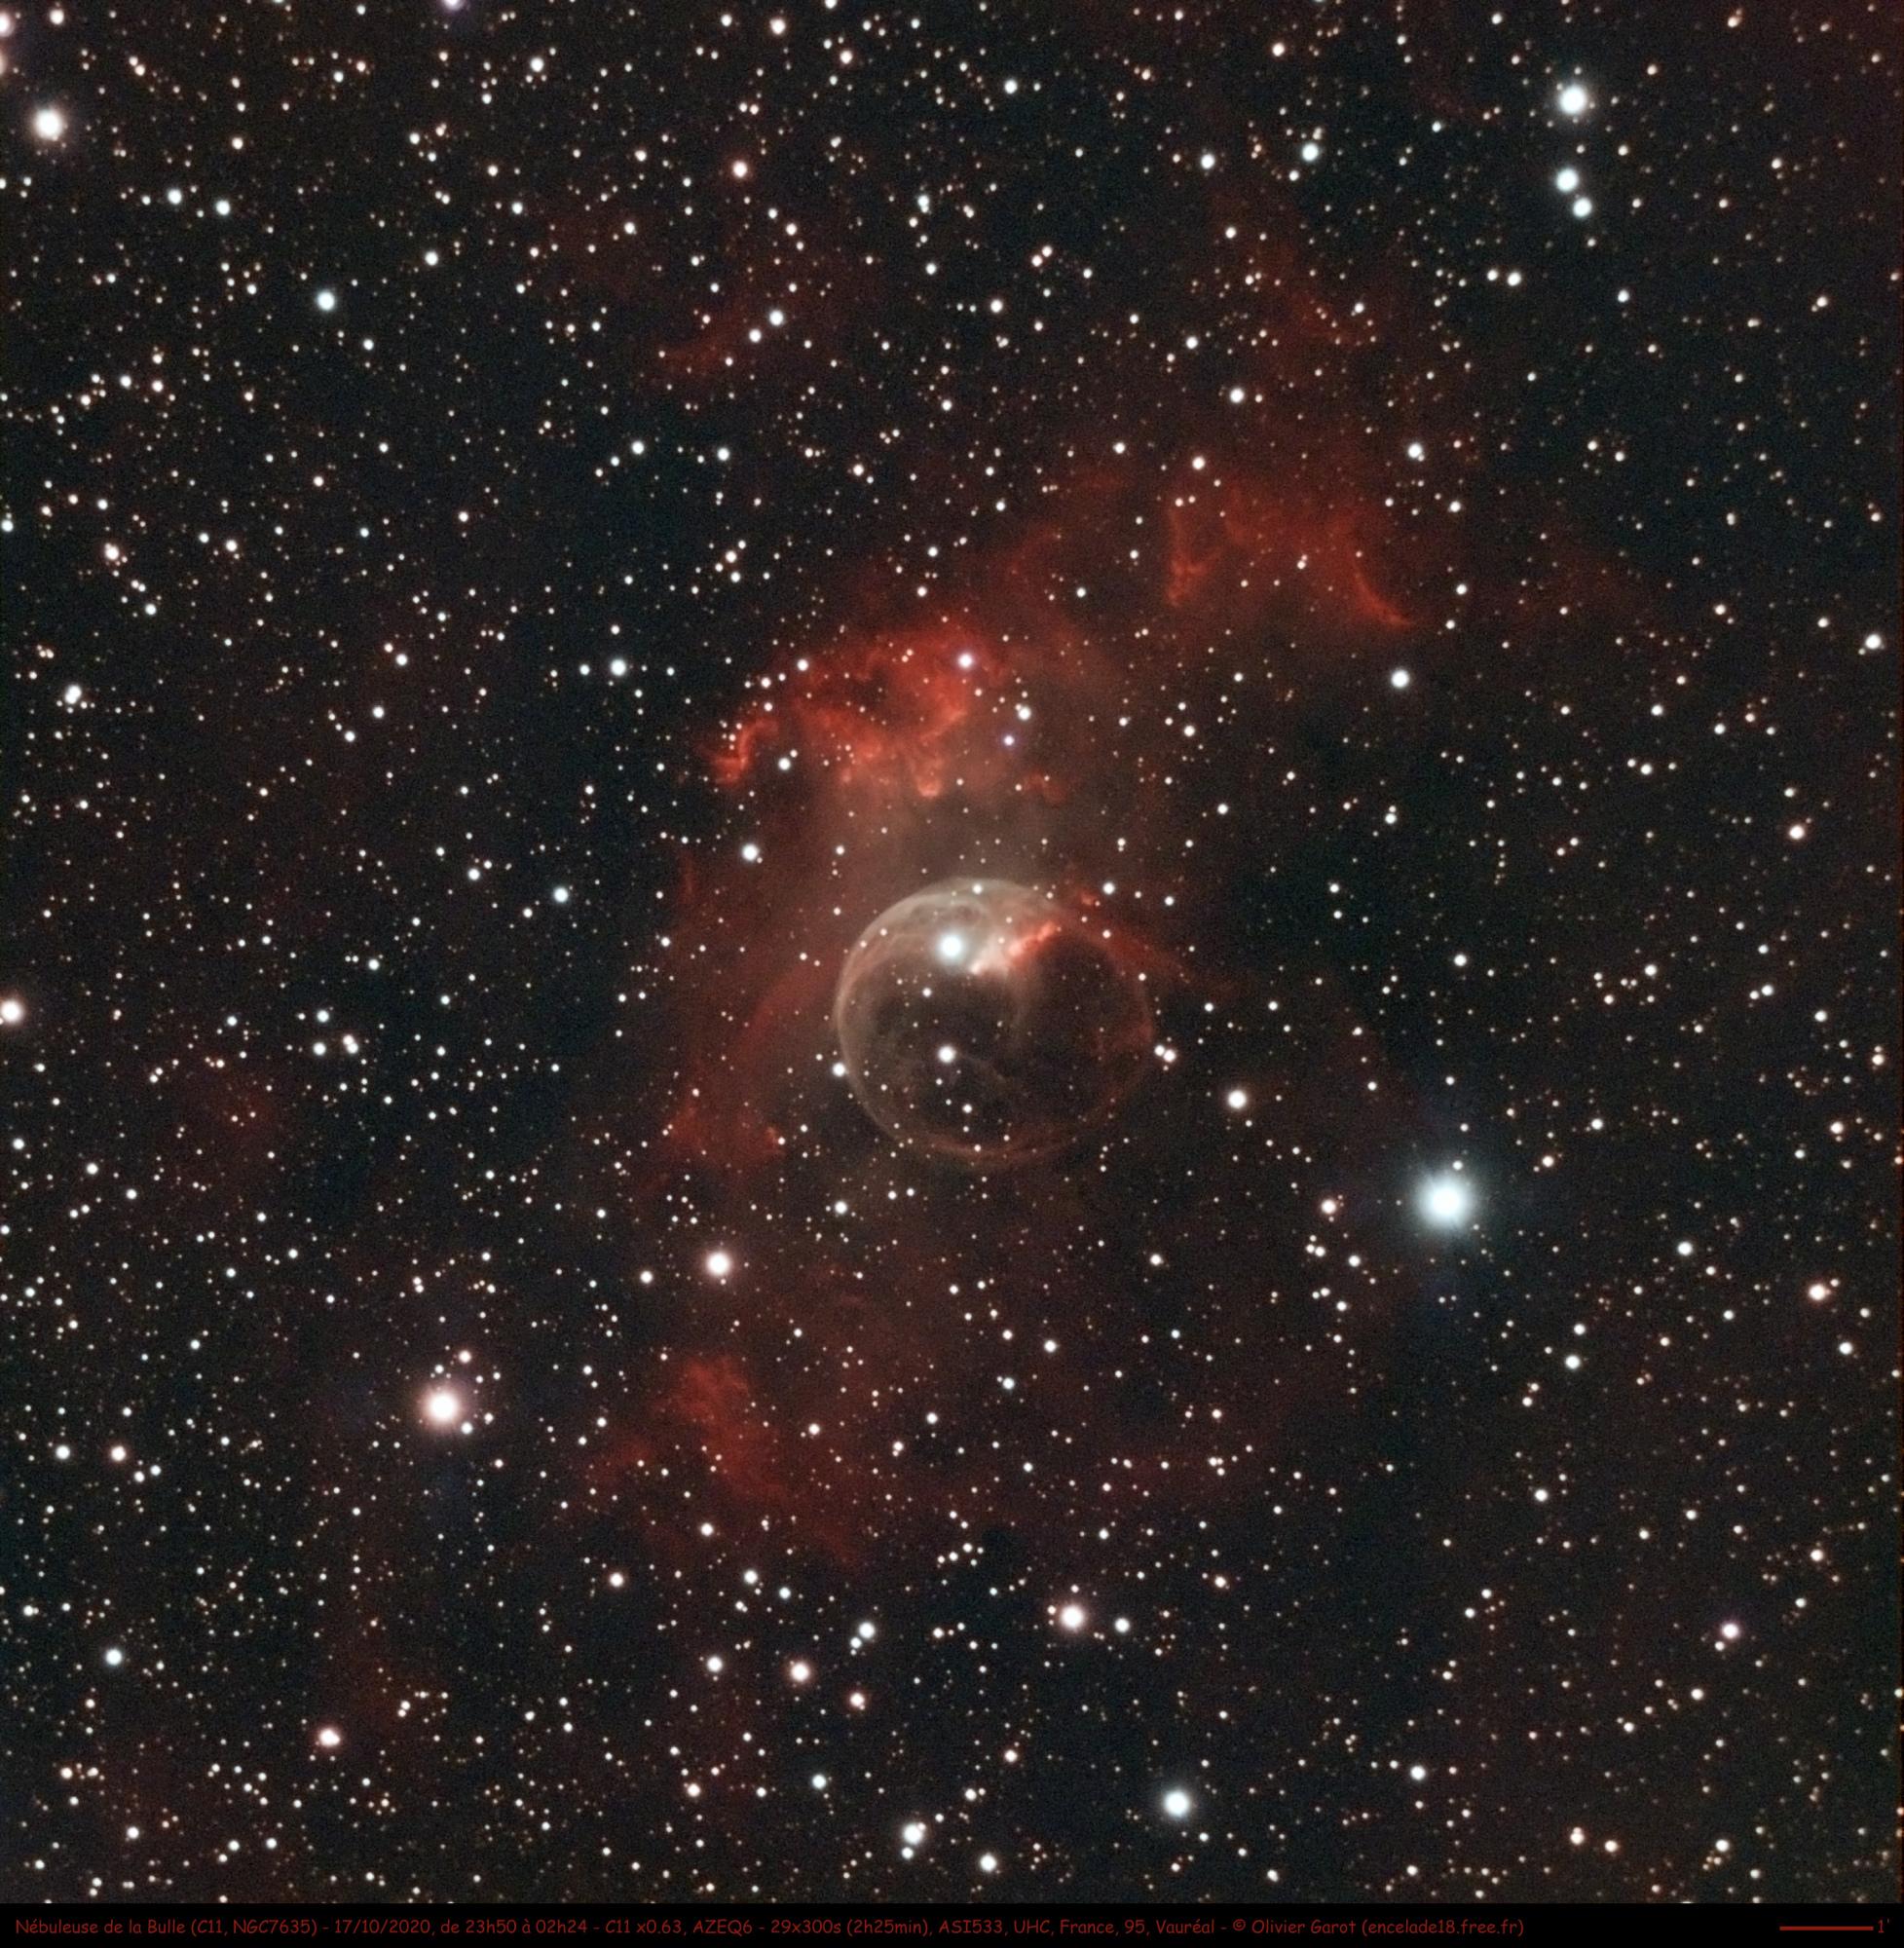 NGC7635_2020_10_17_SSFW_DOF_29im300s_c_s_eG_ecp_th000_tftc1_contA_RB_MFh_coulA_sat_rbm_niv_og.thumb.jpg.bfac96ca683a388dcd3219fdfbb70941.jpg